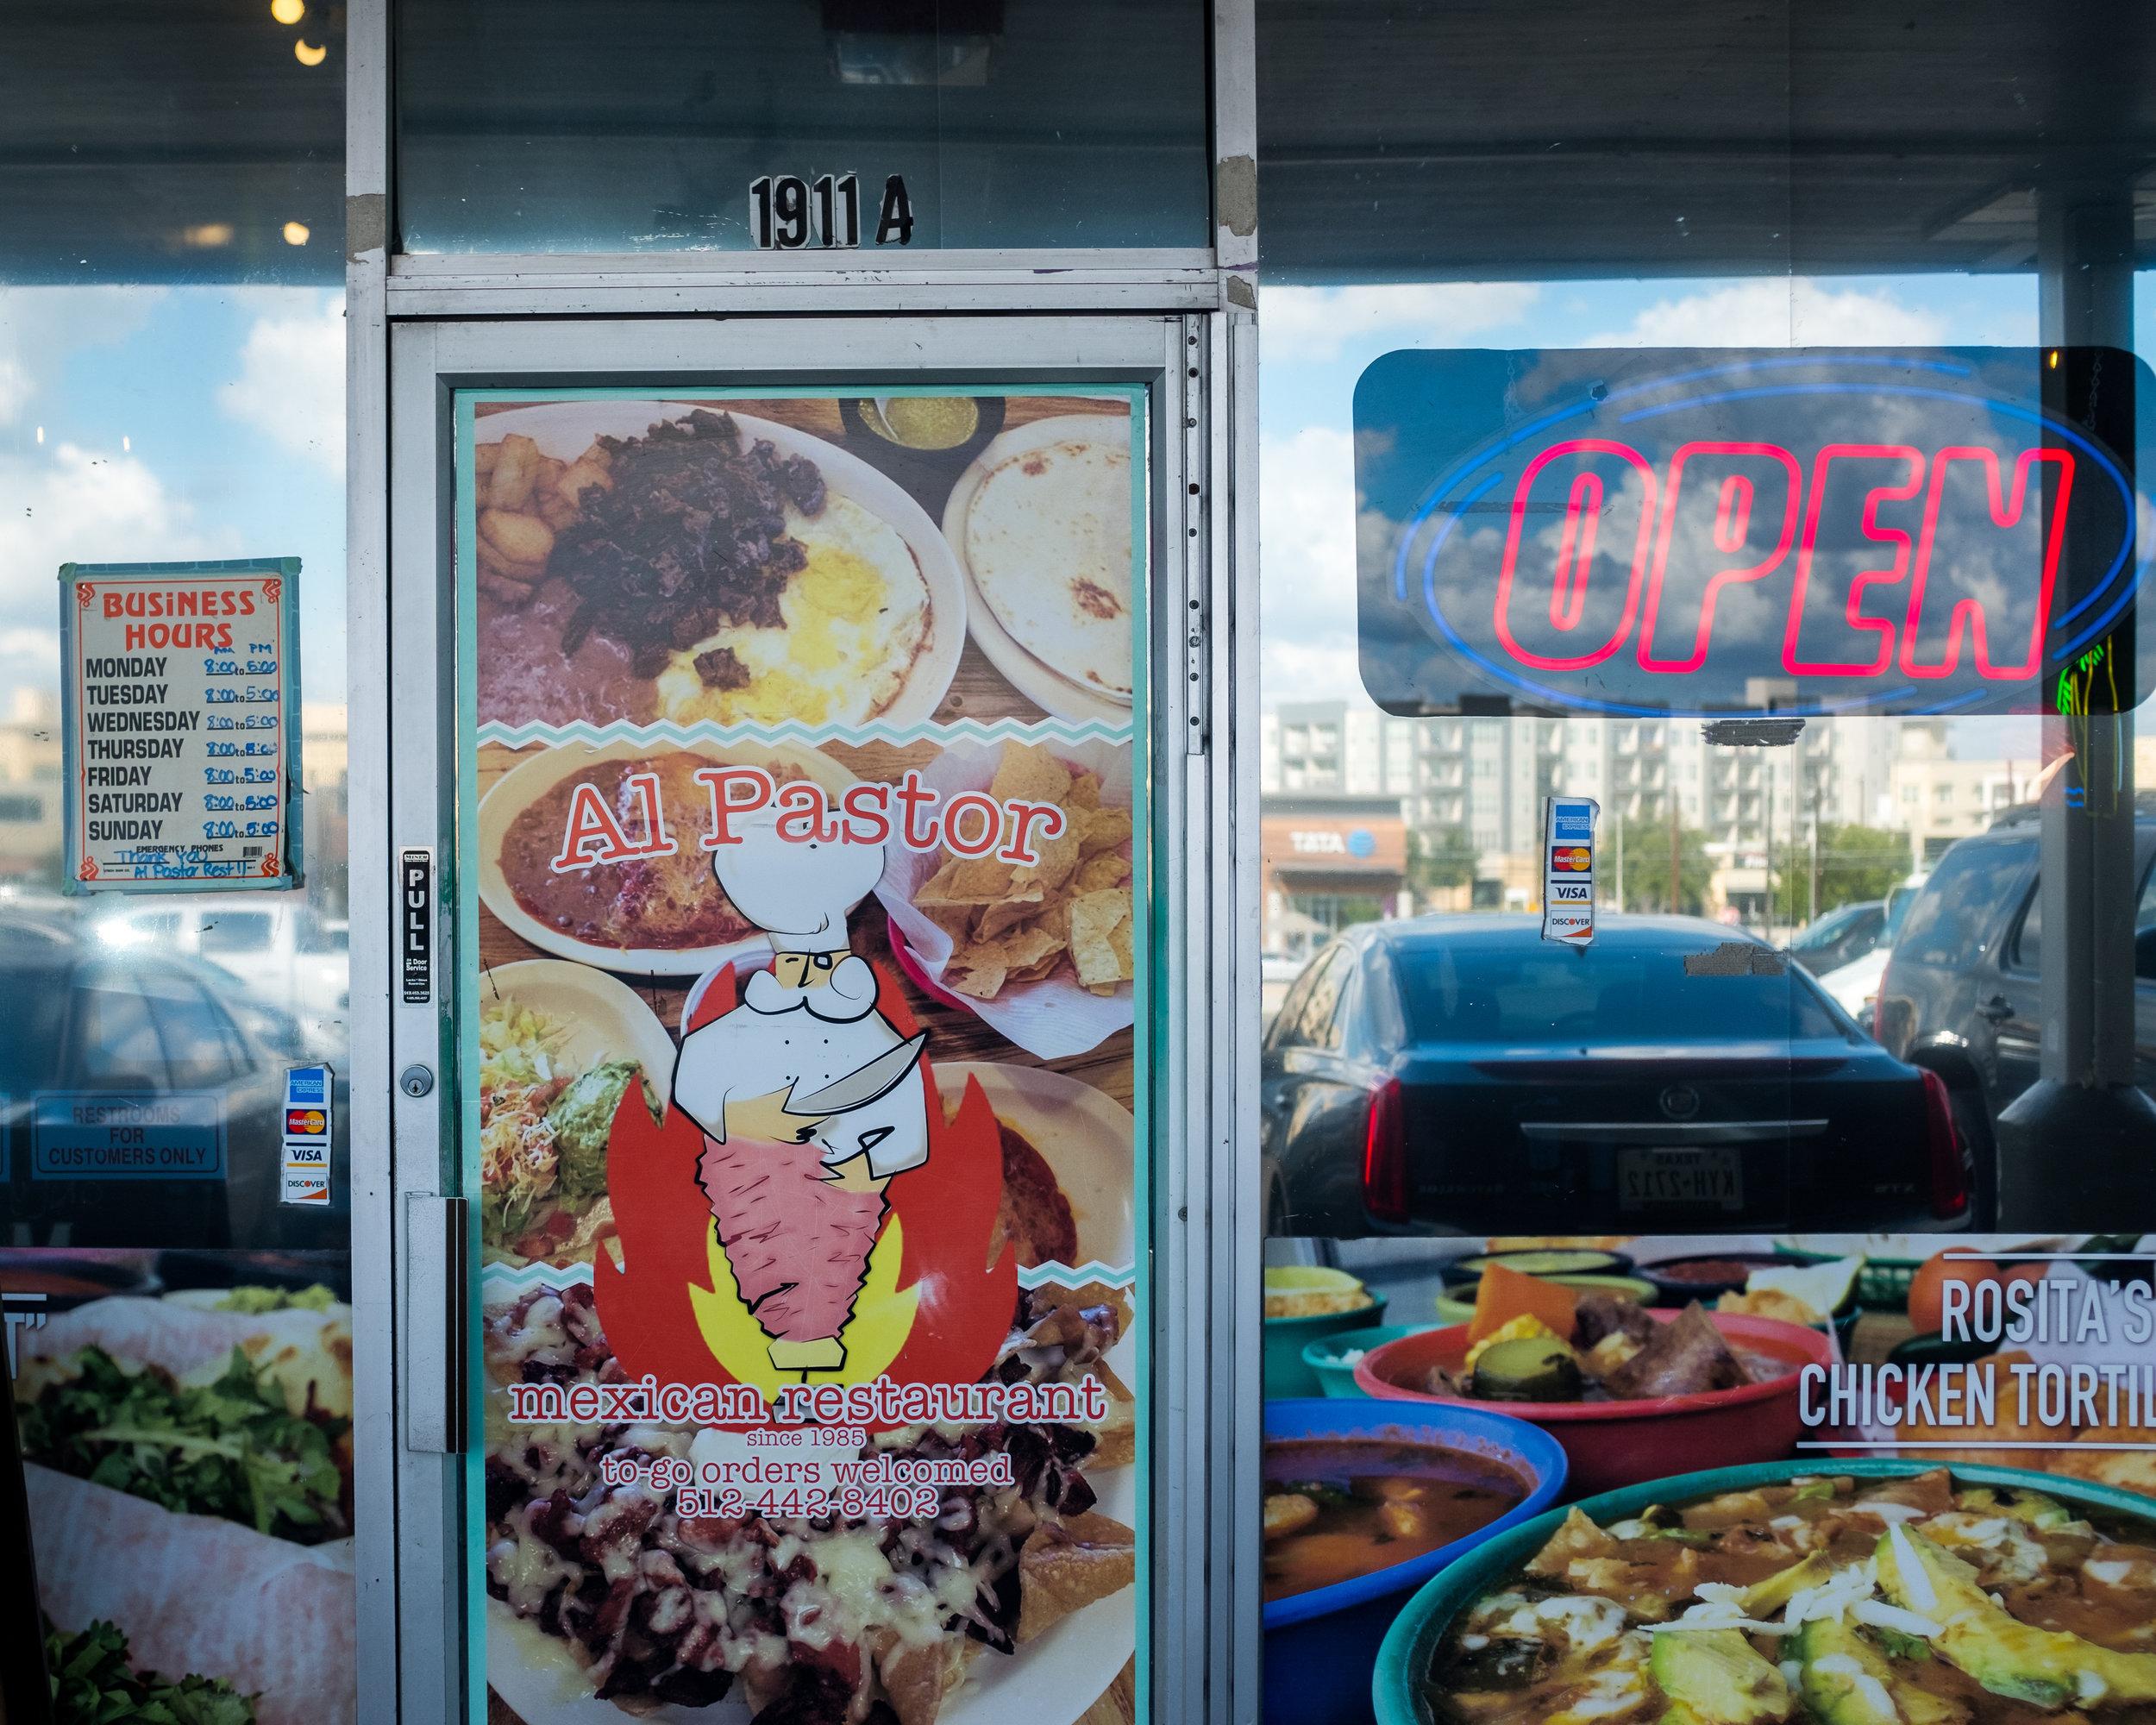 Rosita's Al Pastor storefront on East Riverside